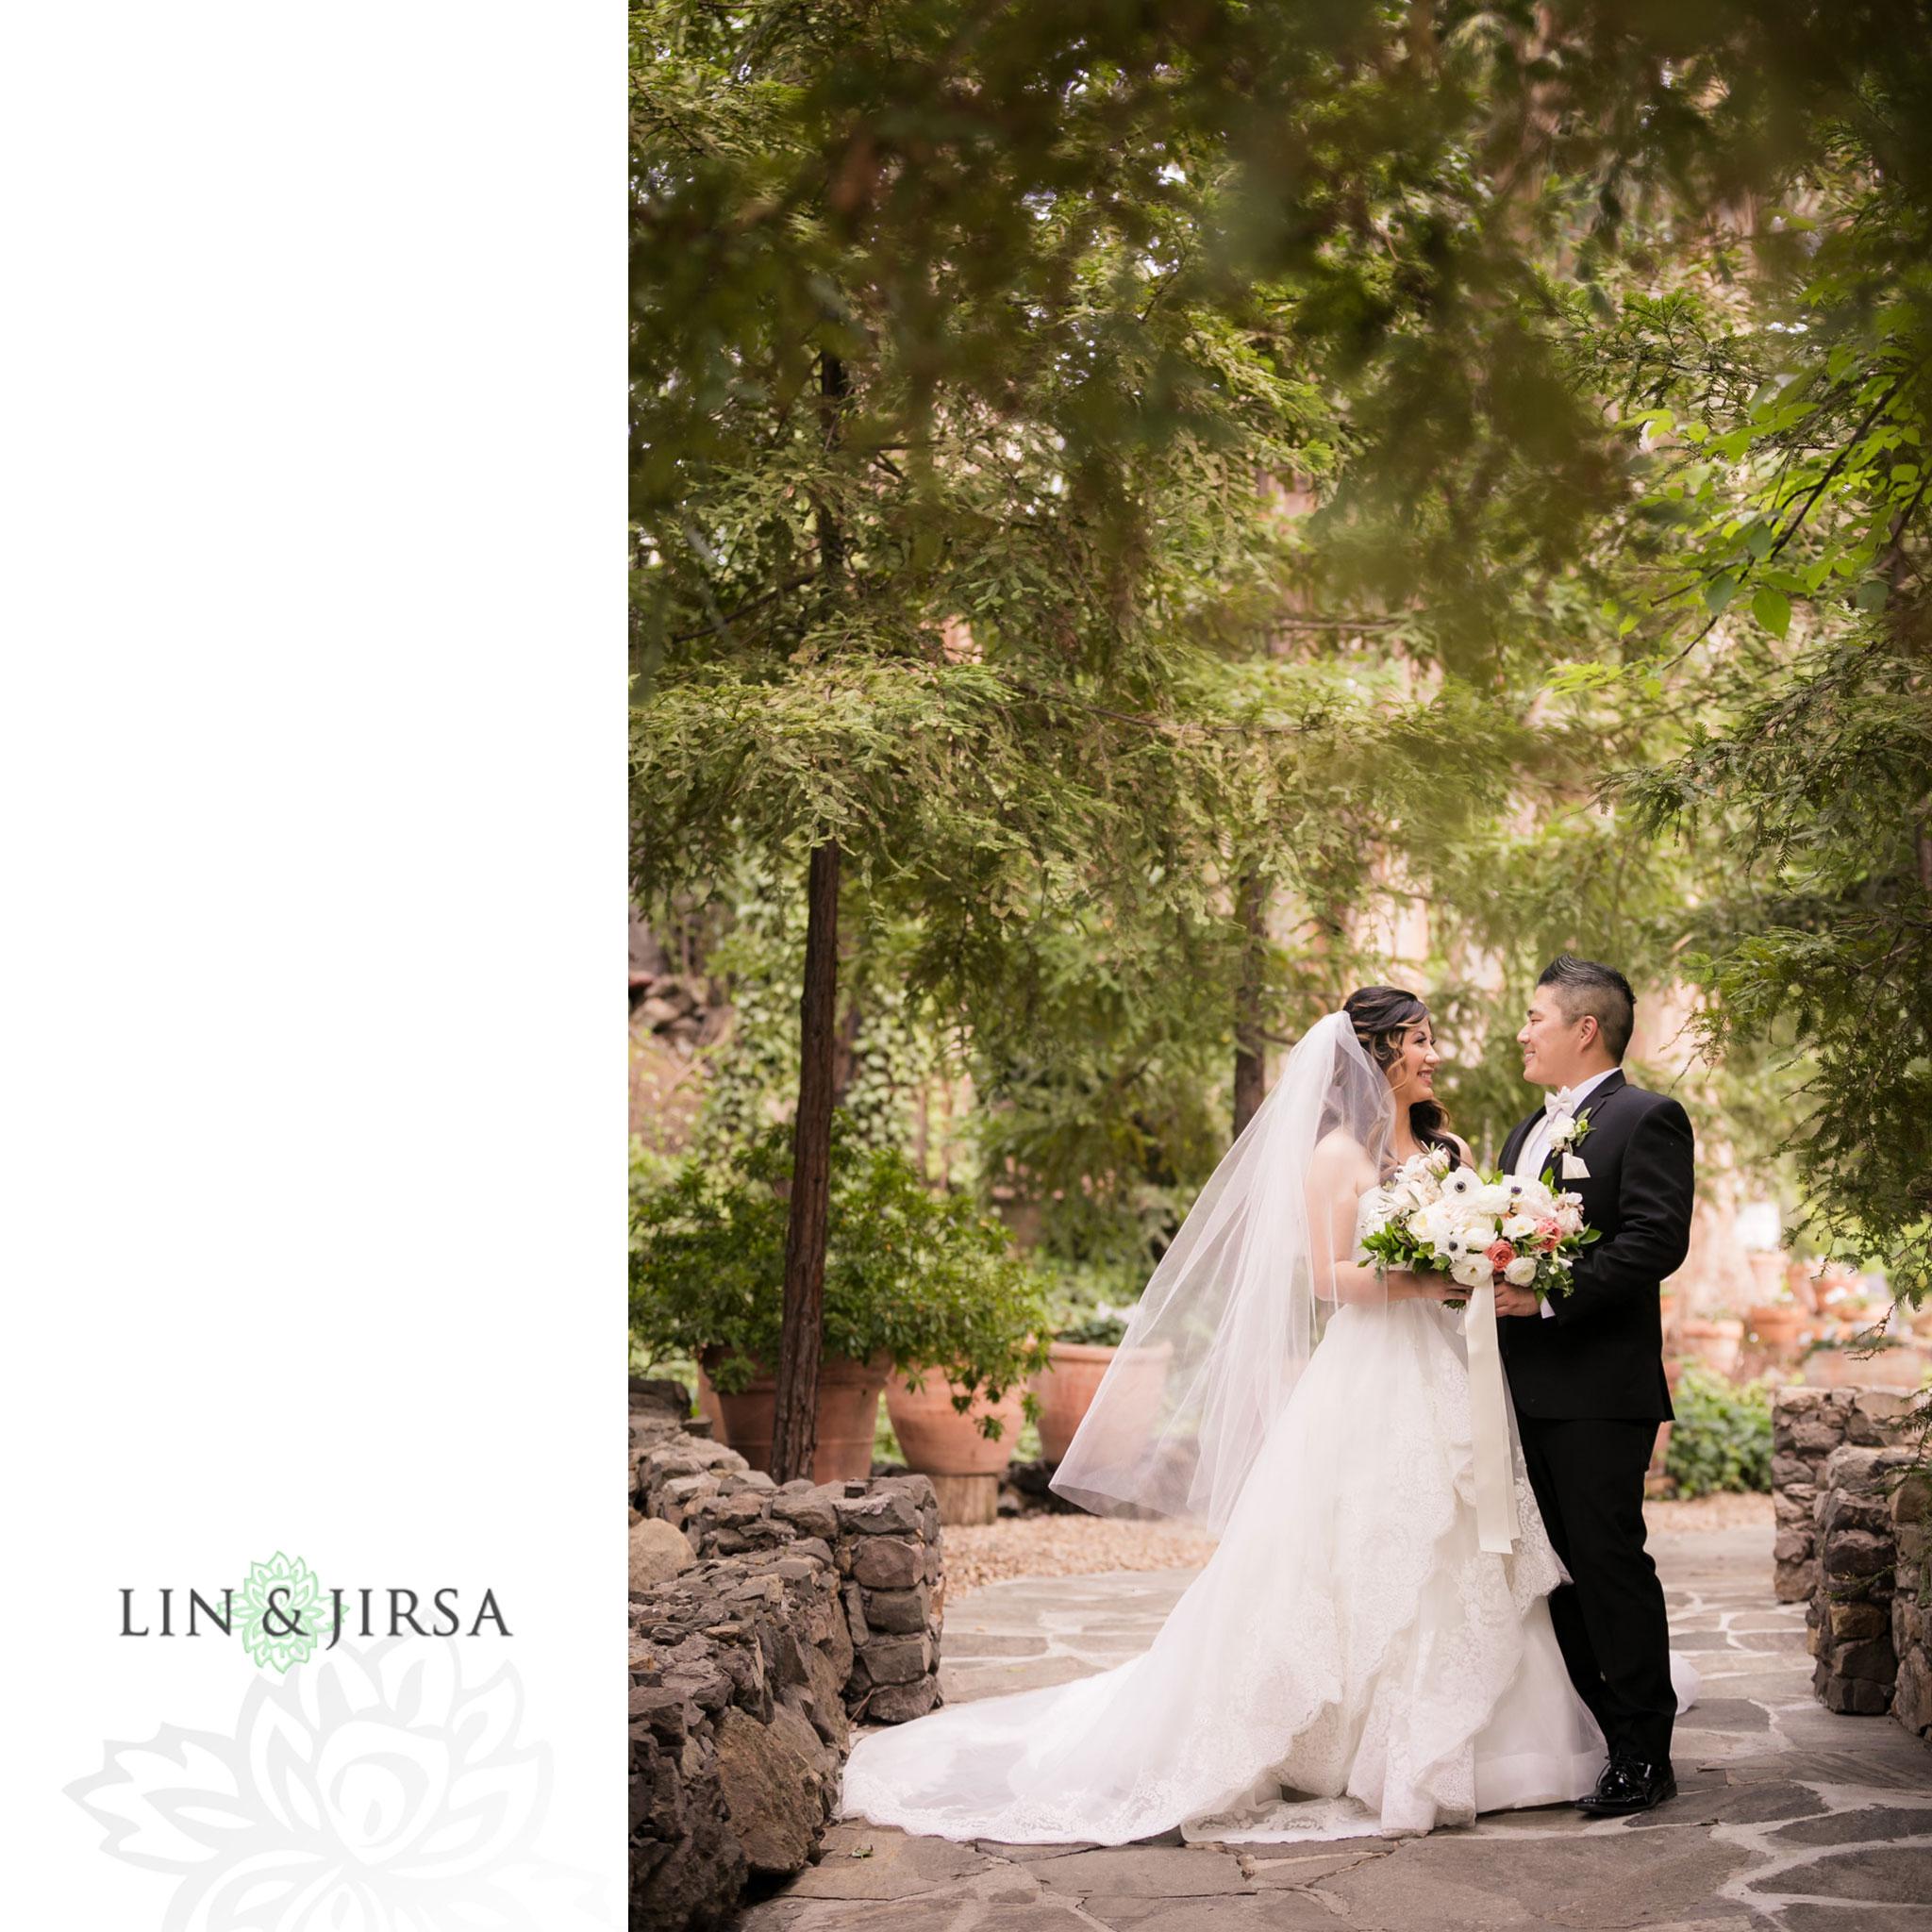 13 calamigos ranch malibu first look wedding photography